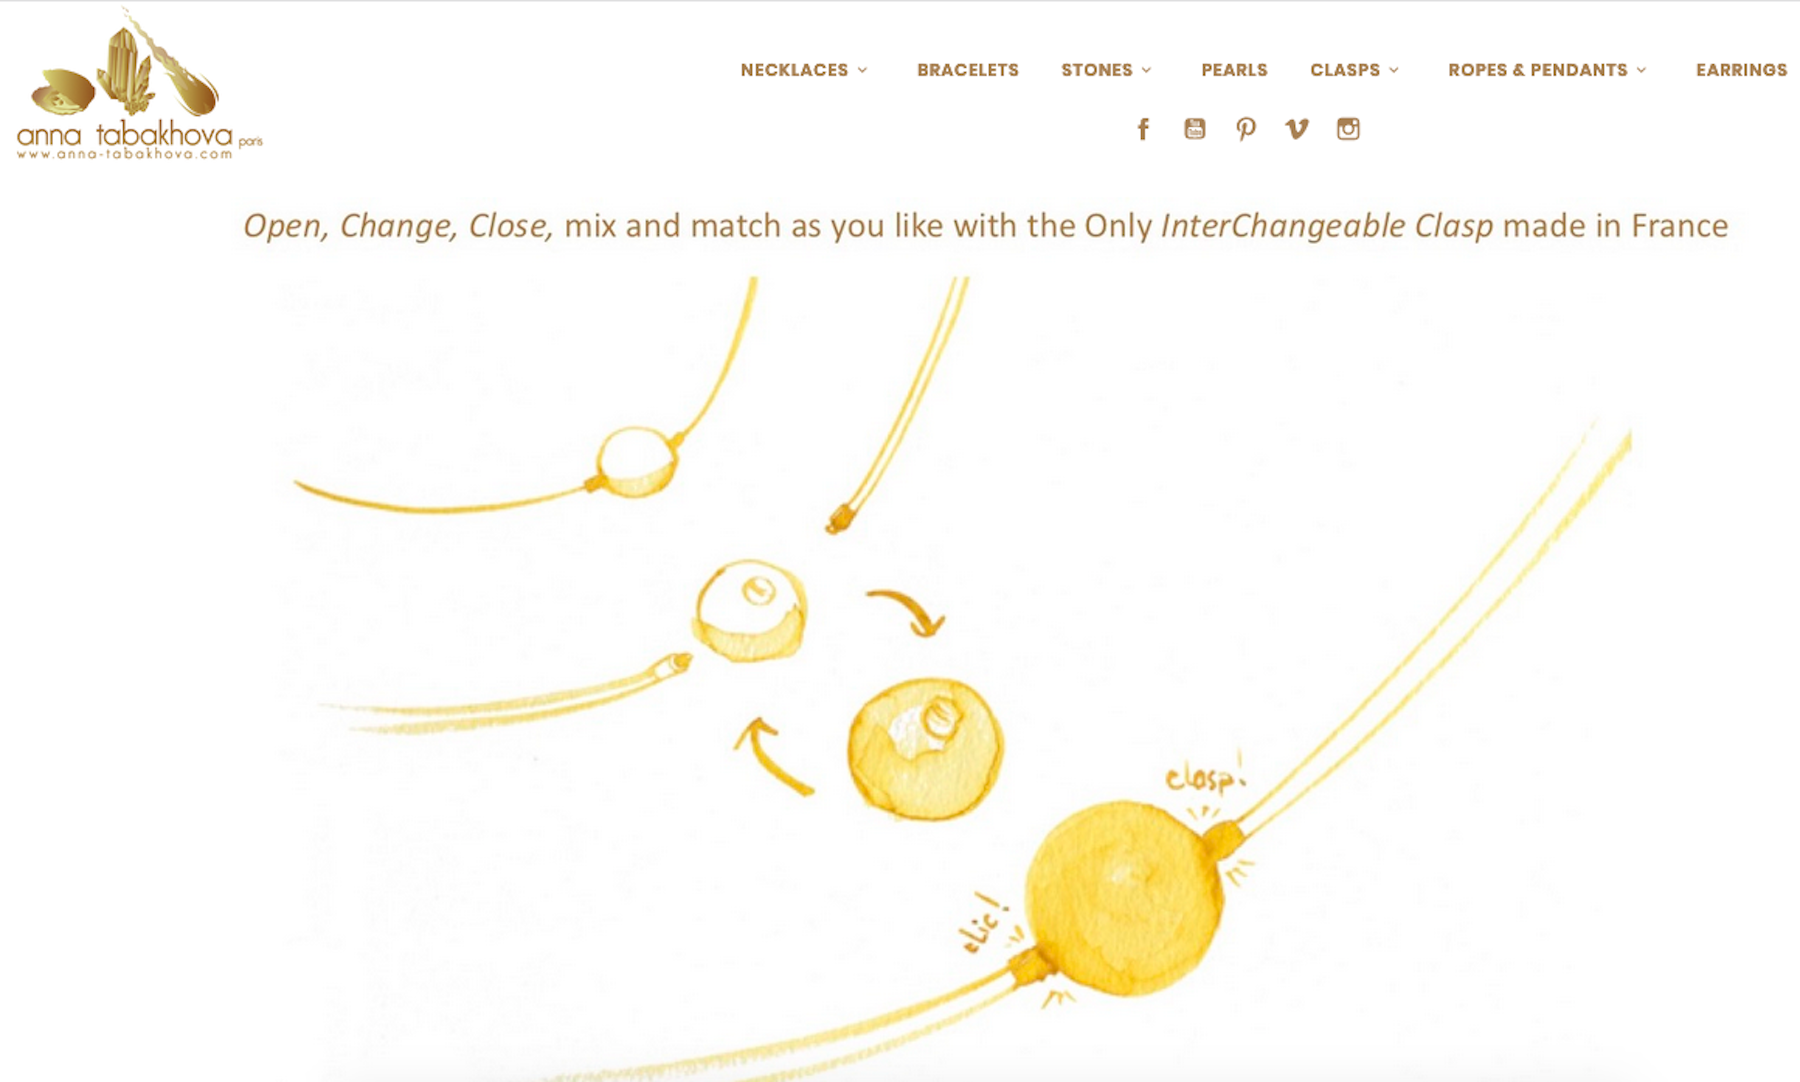 Buy on Line Interchangeable clasps